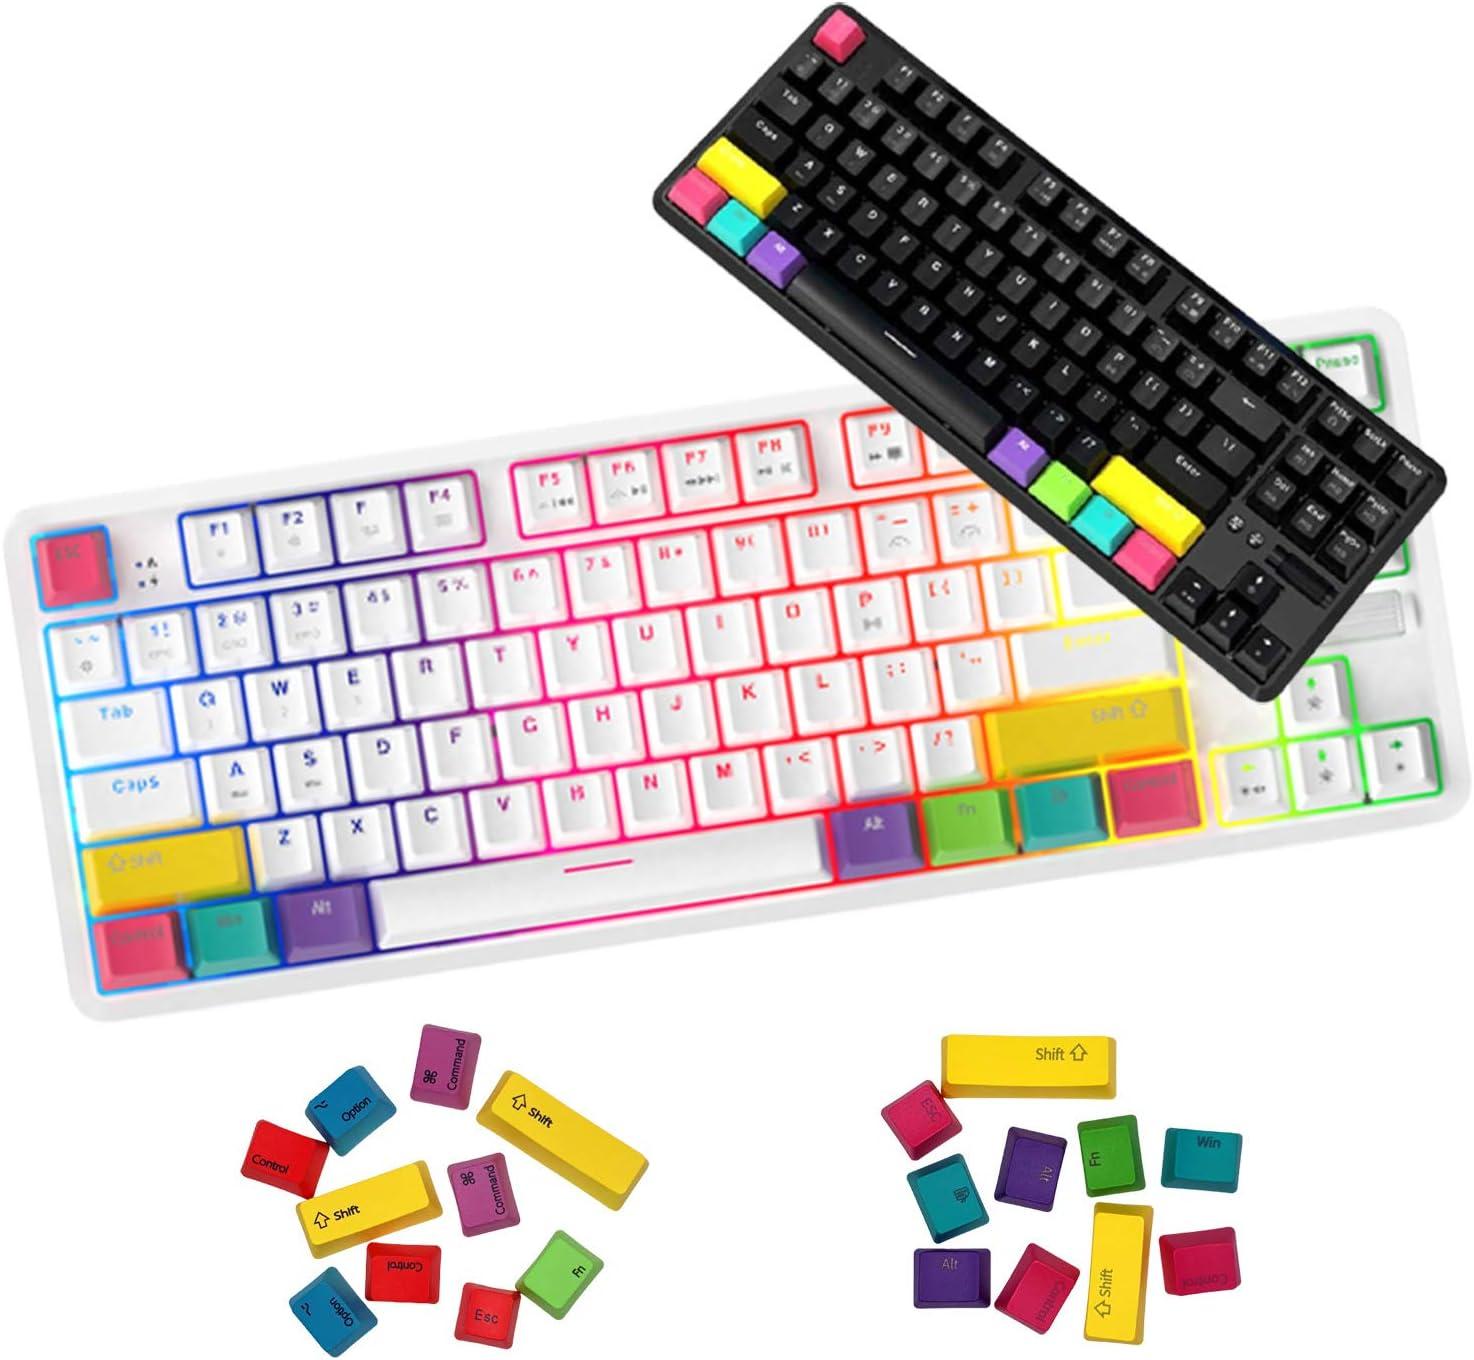 [KORDO] Ajazz K870T 87Keys Bluetooth Wired/Wireless Mac/MacBook Mechanical Keyboard with Additional Keycaps for Mac/Window, Type-C Cable. (Black, Blue Switch)